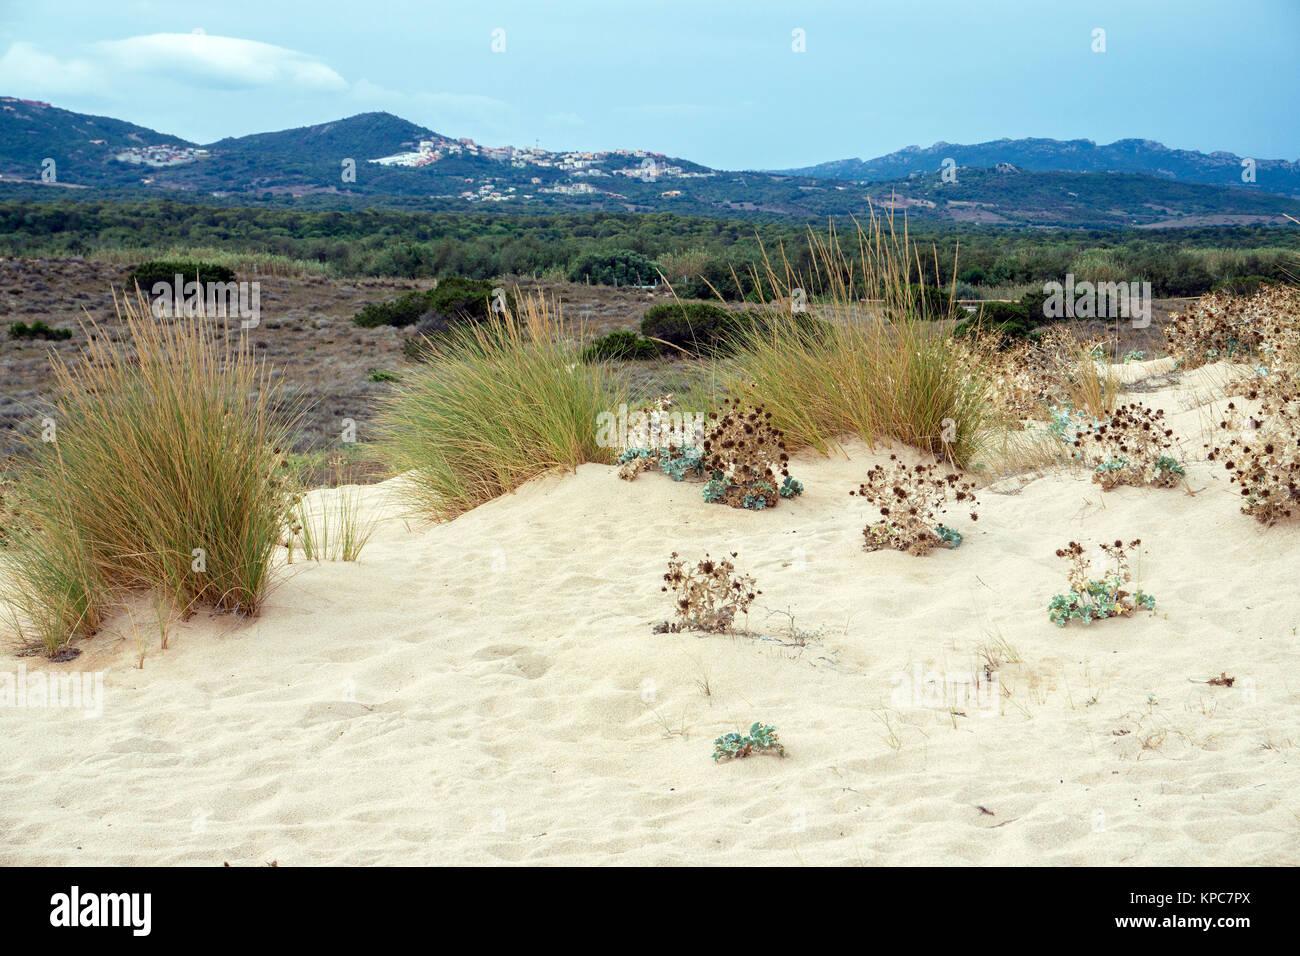 Sandduenen am Strand Spiaggia del Liscia, Porto Pollo, Sardinien, Italien, Mittelmeer, Europa | Dune grass on sand - Stock Image